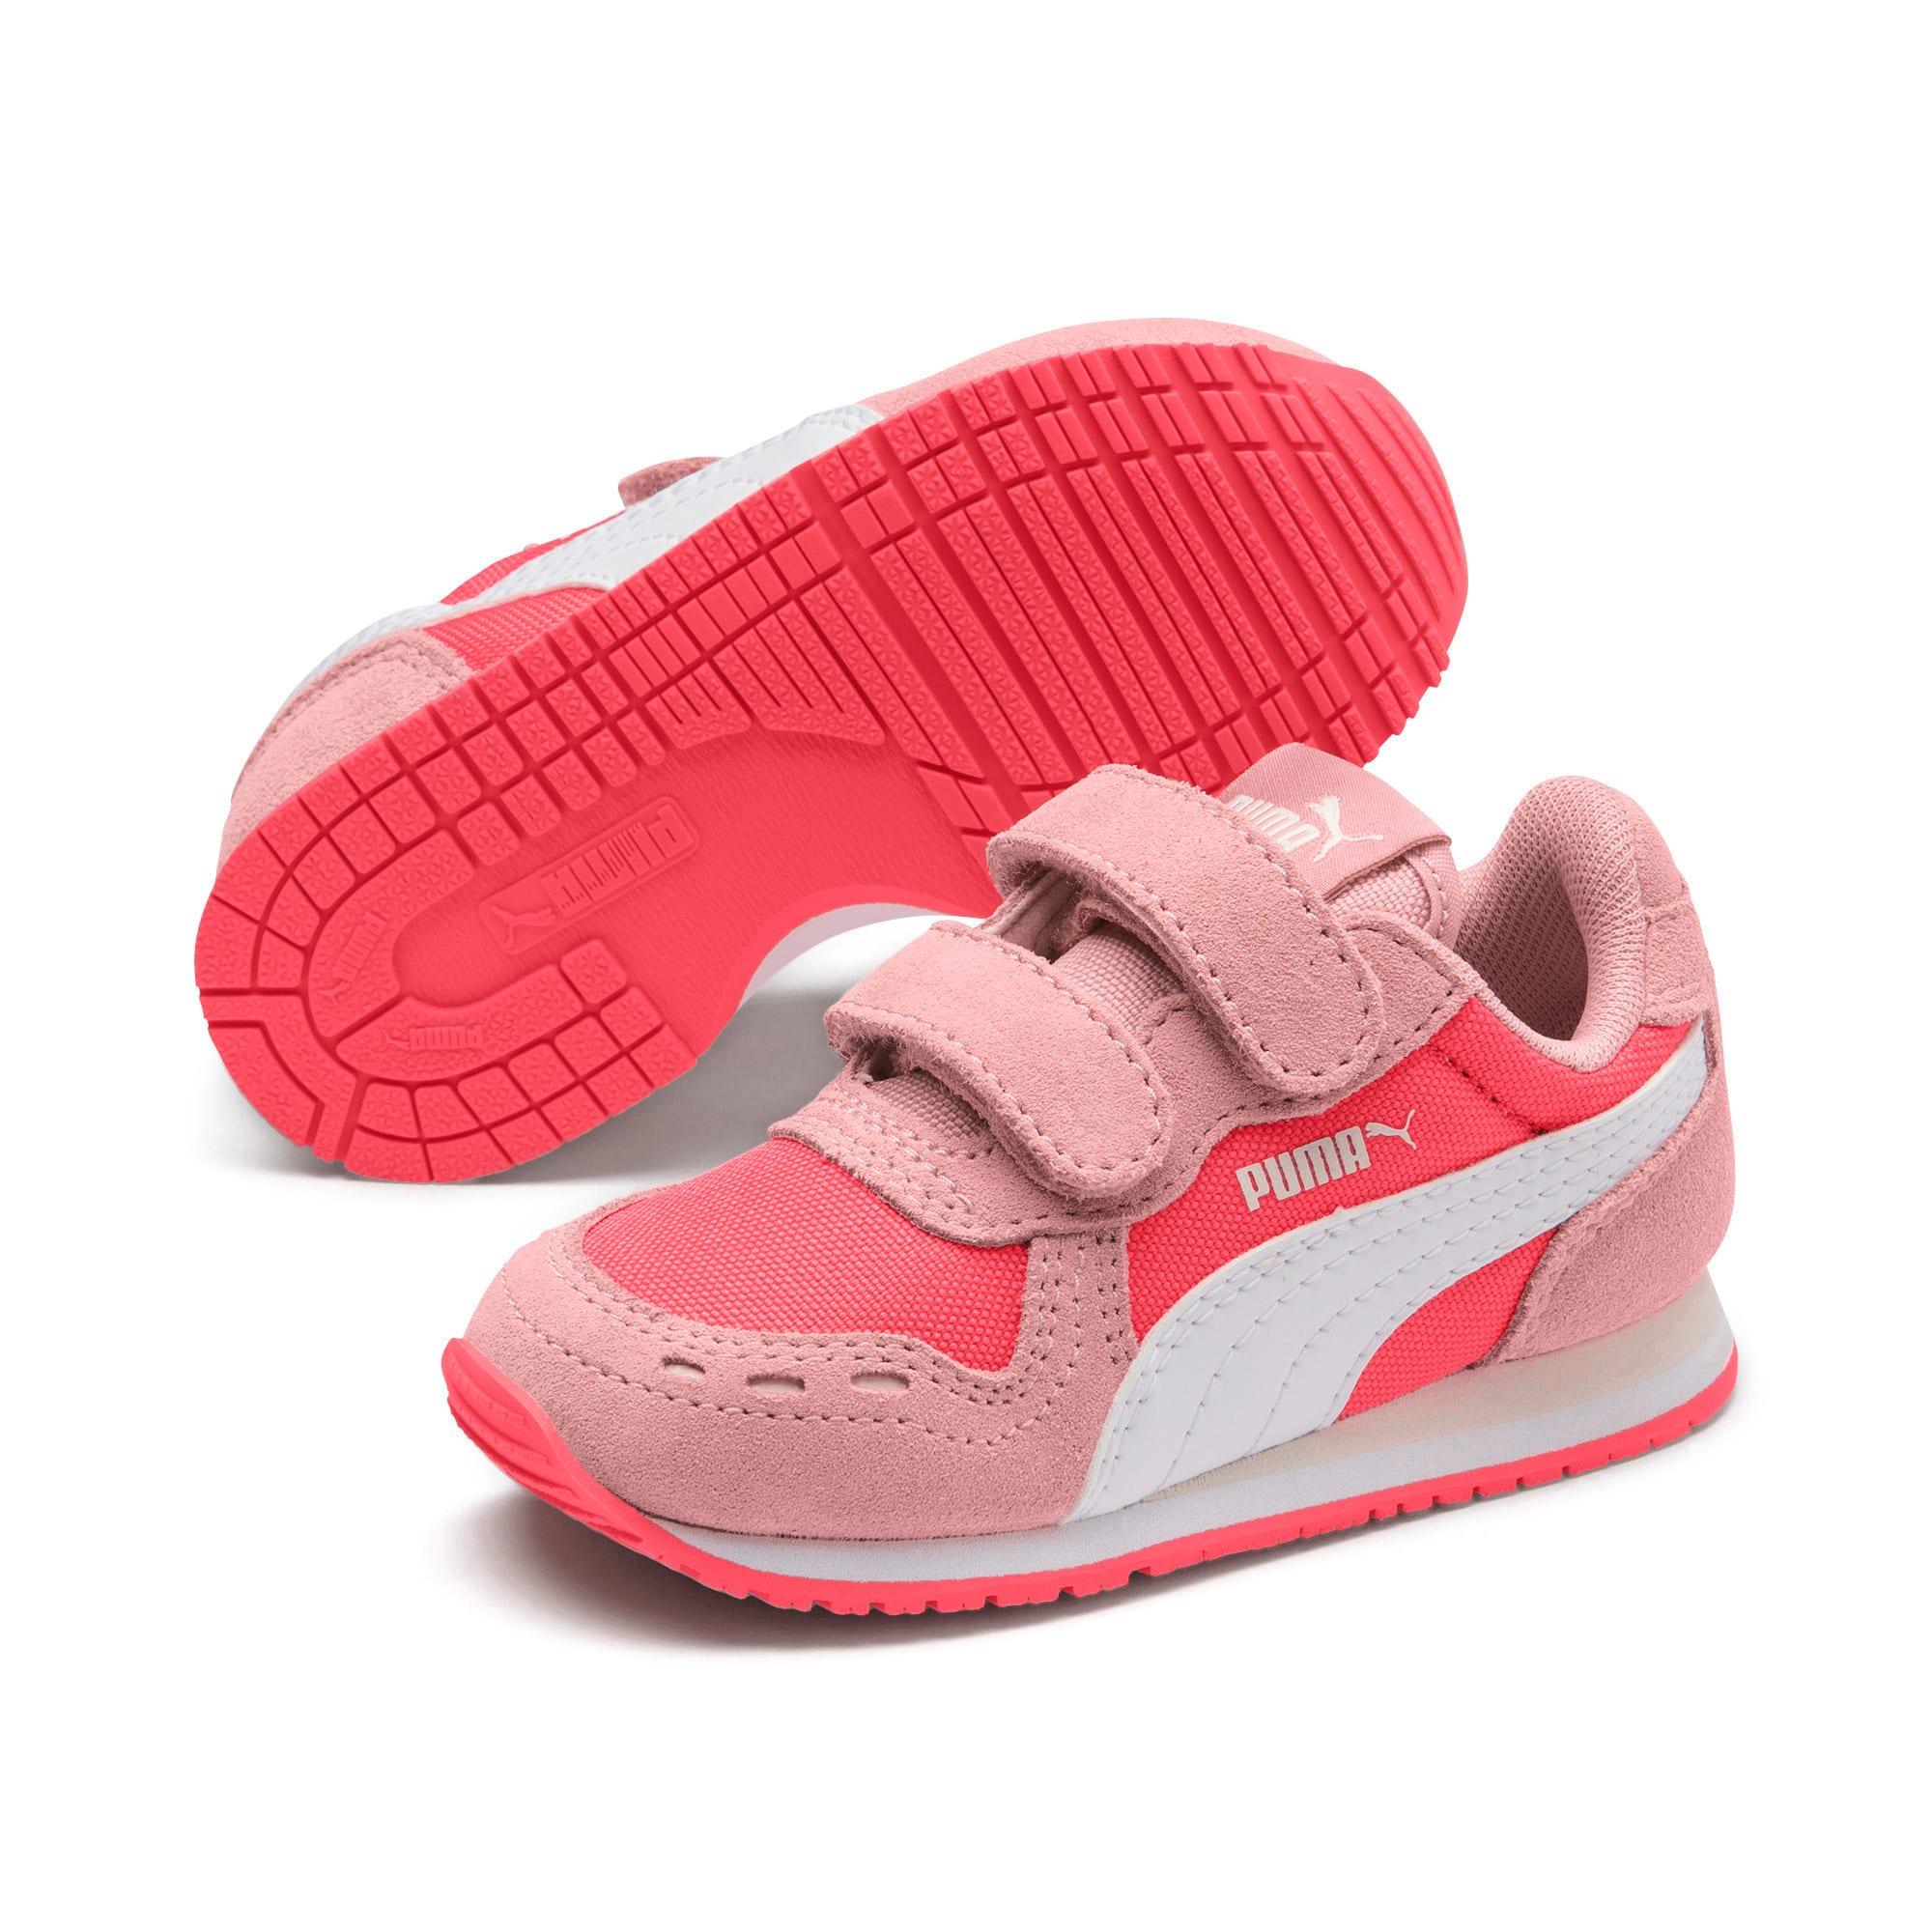 Thumbnail 2 of Cabana Racer Toddler Shoes, Calypso Coral-Bridal Rose, medium